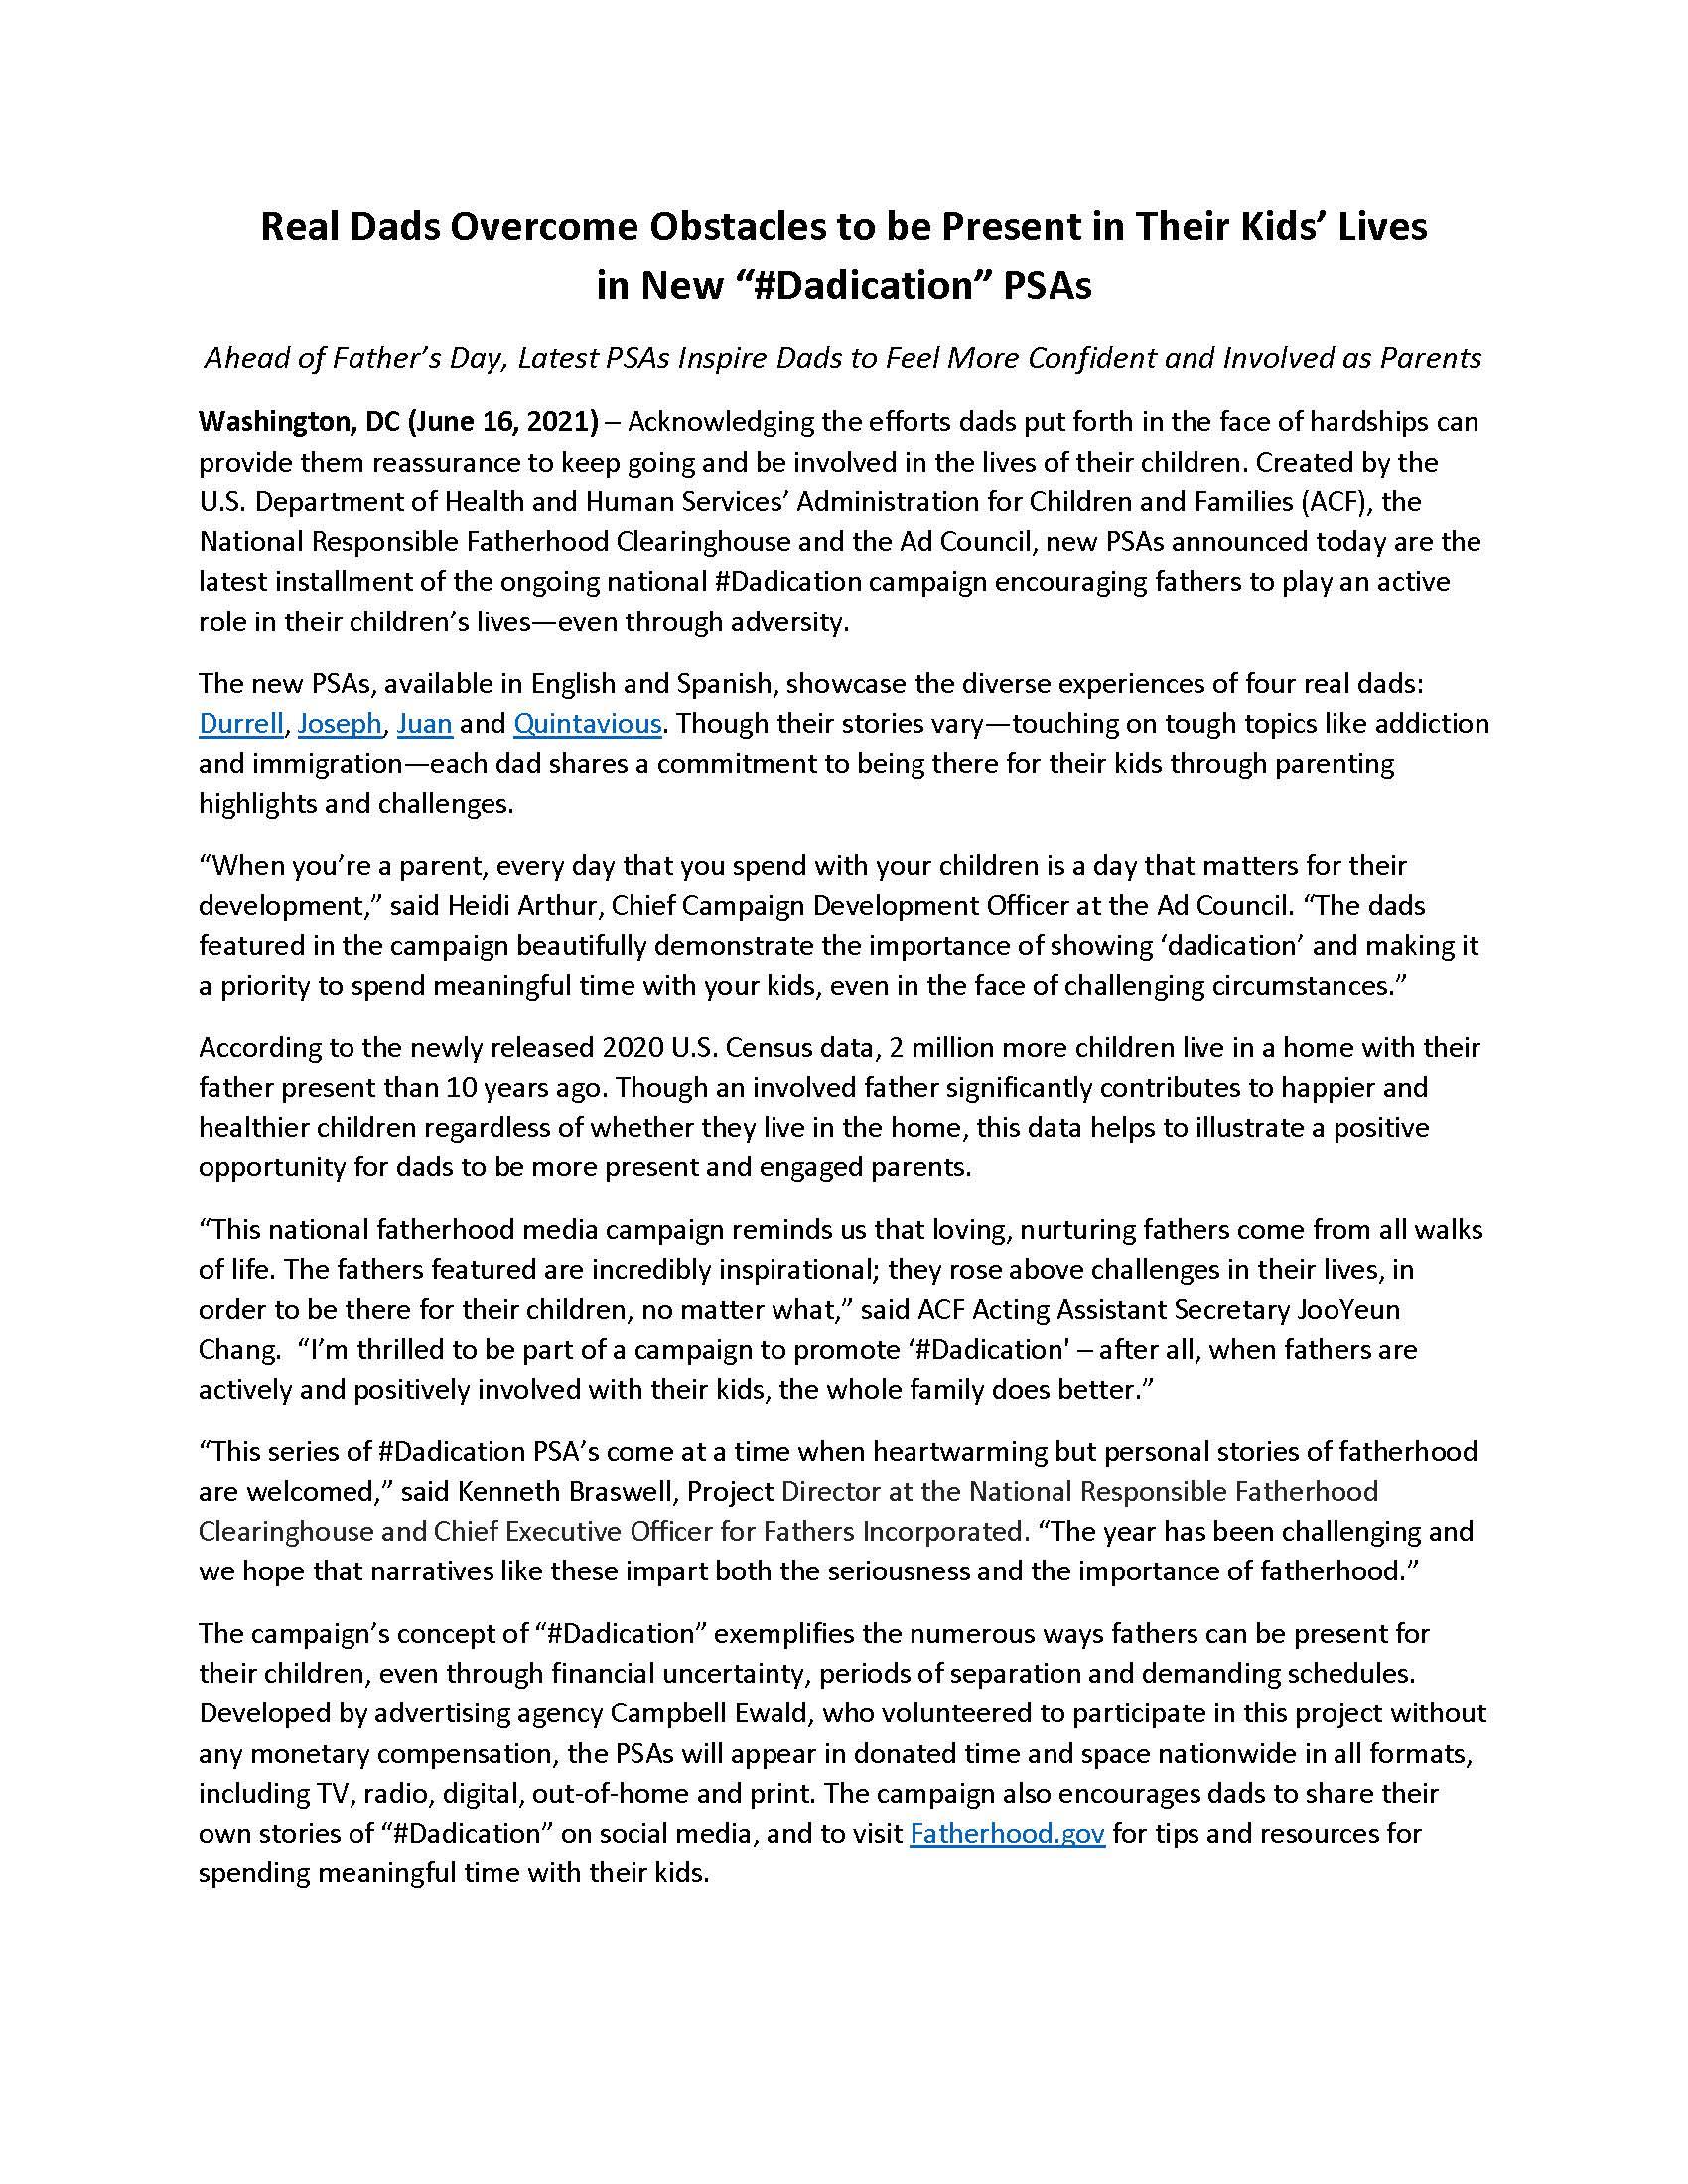 Fatherhood June 2021 Press Release_FINAL_Page_1